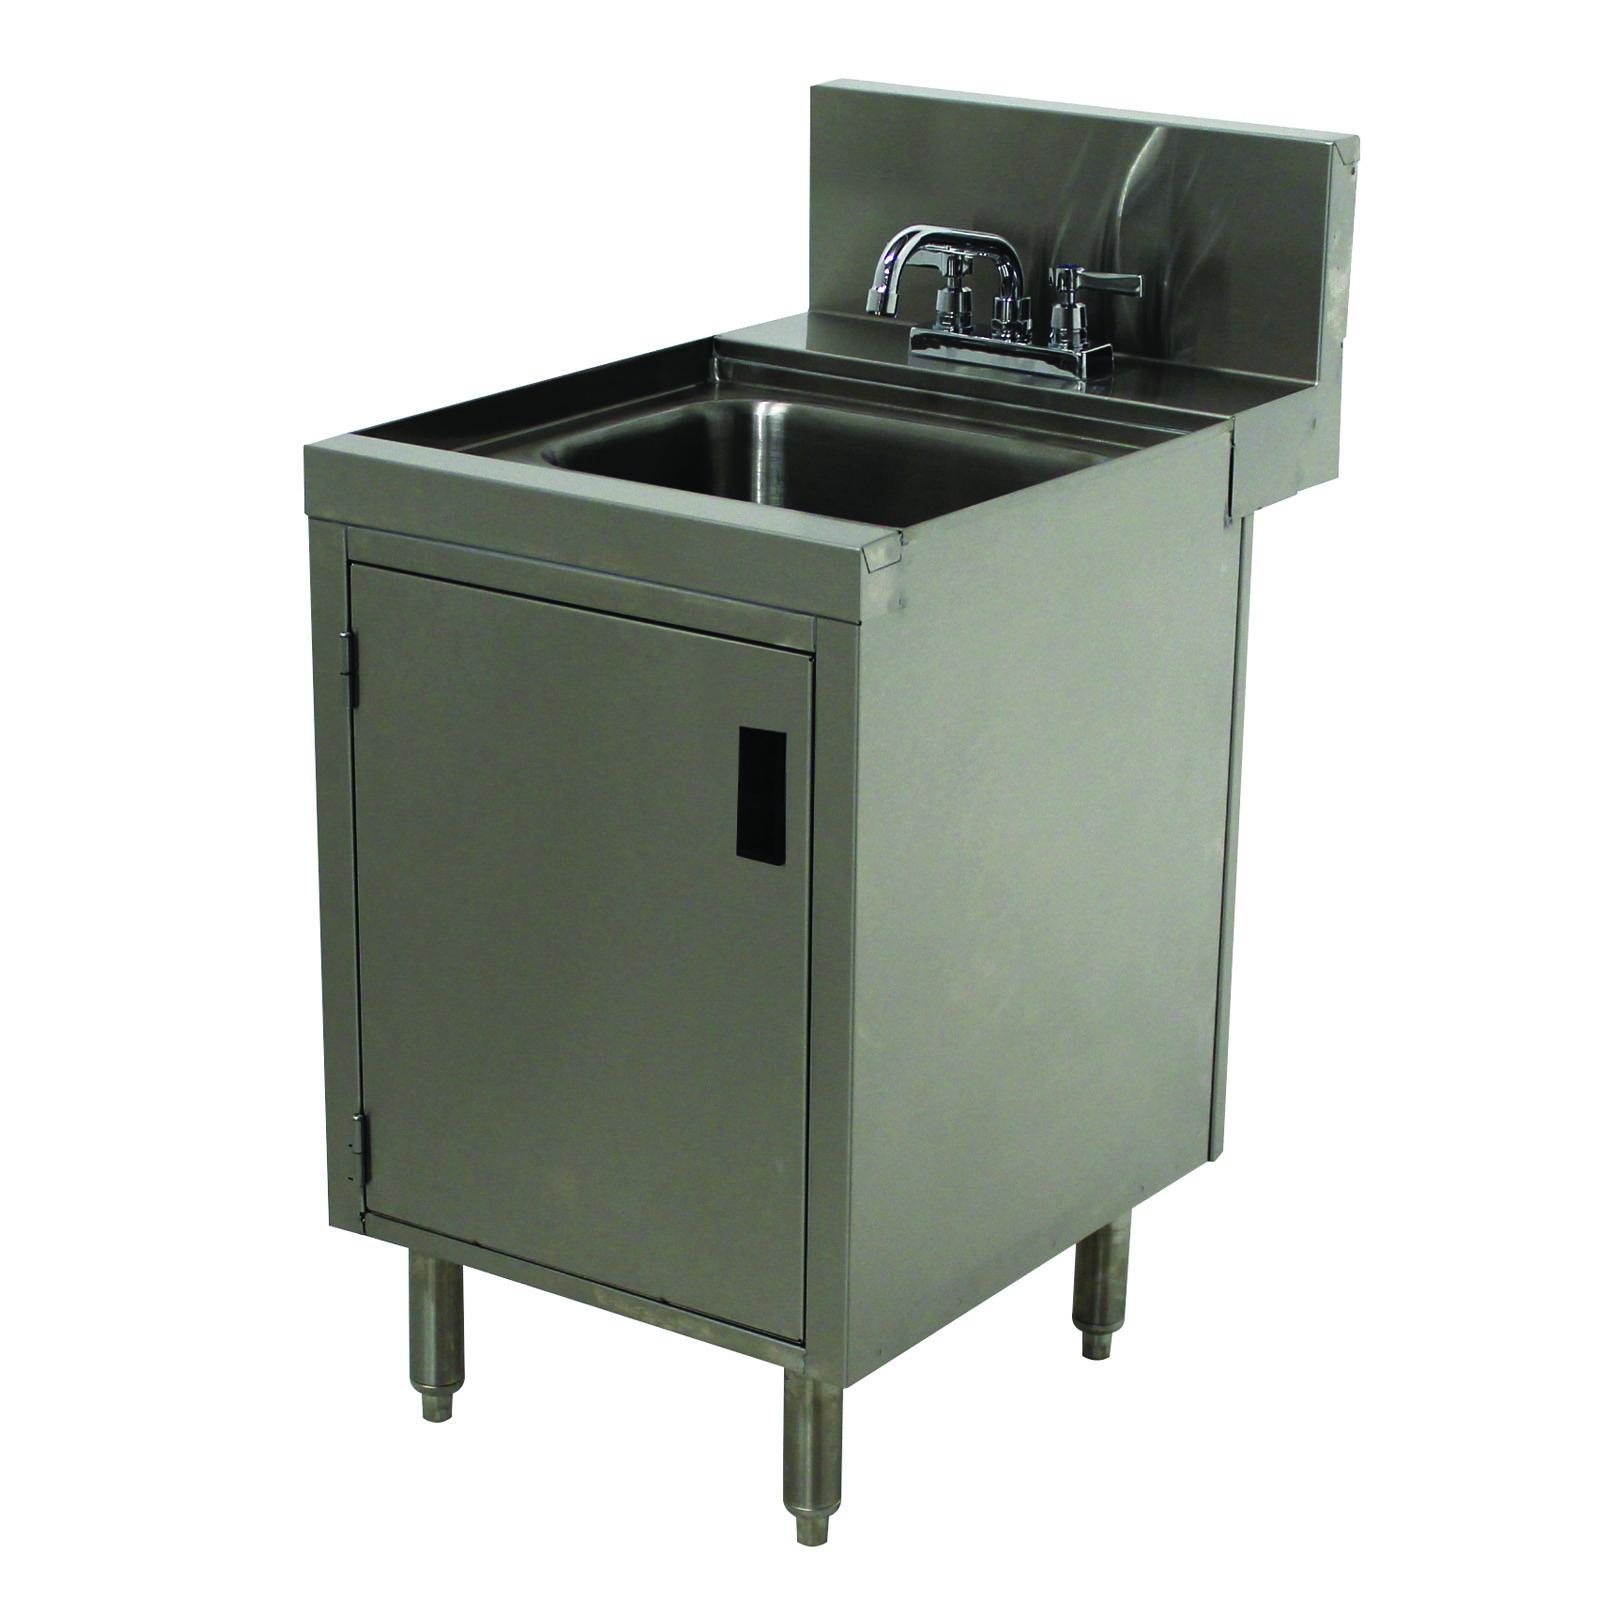 Advance Tabco PRHSC-24-18 underbar hand sink unit